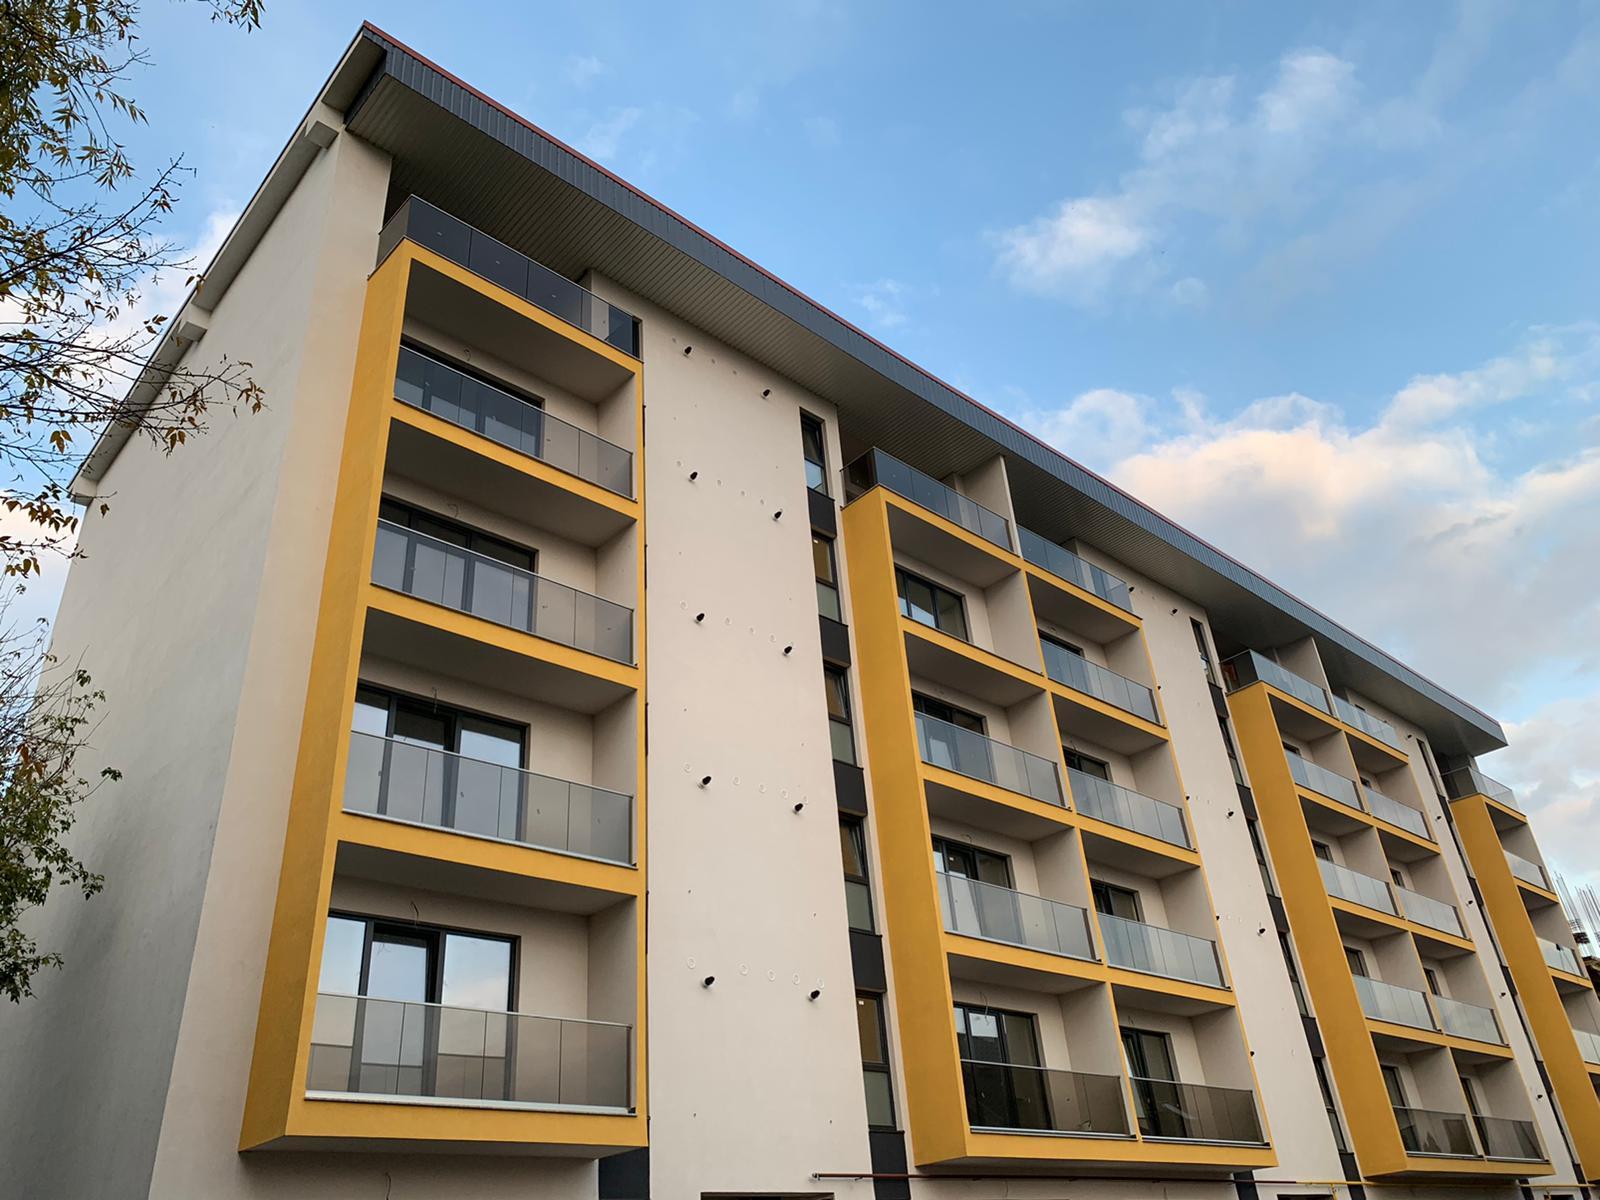 Construcții Civile și Industriale UrBAN House 3